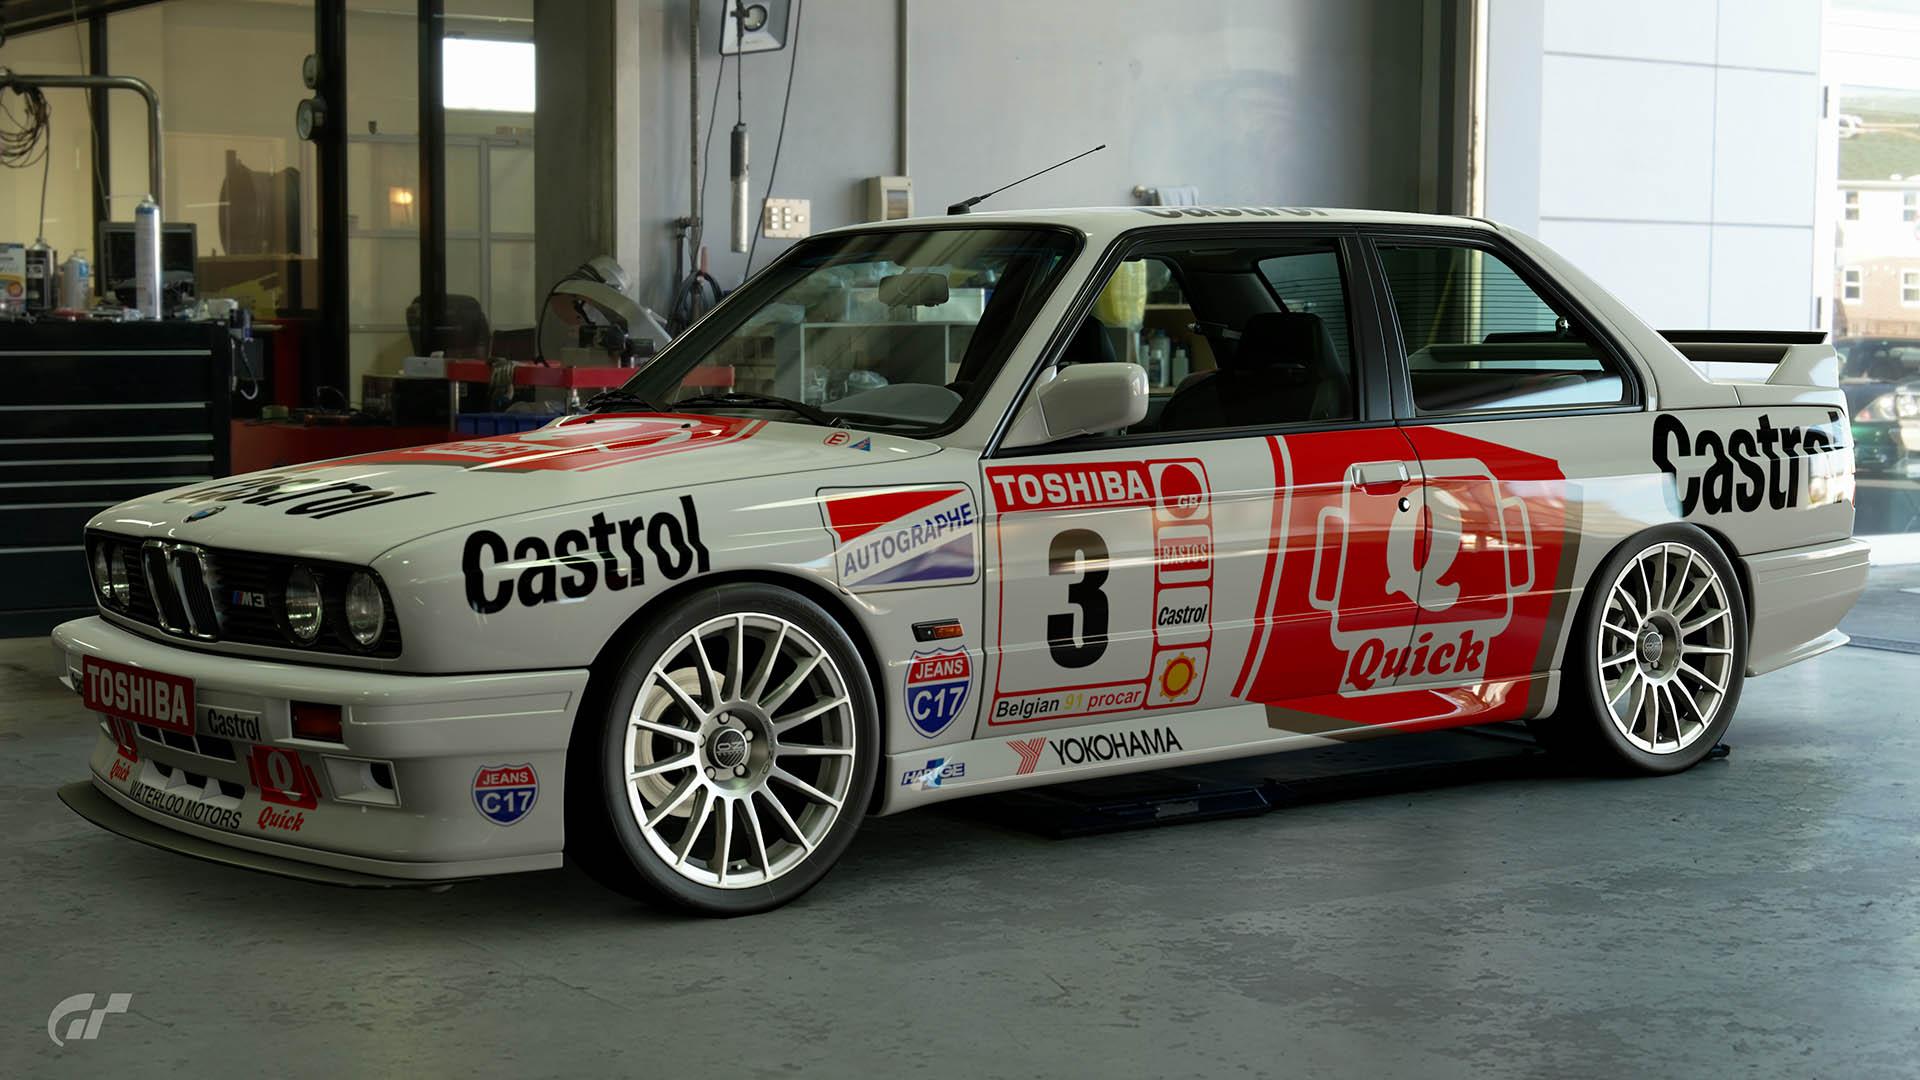 1991 Jean-Michel Martin Belgian Procar Hartge BMW M3-260 Livery